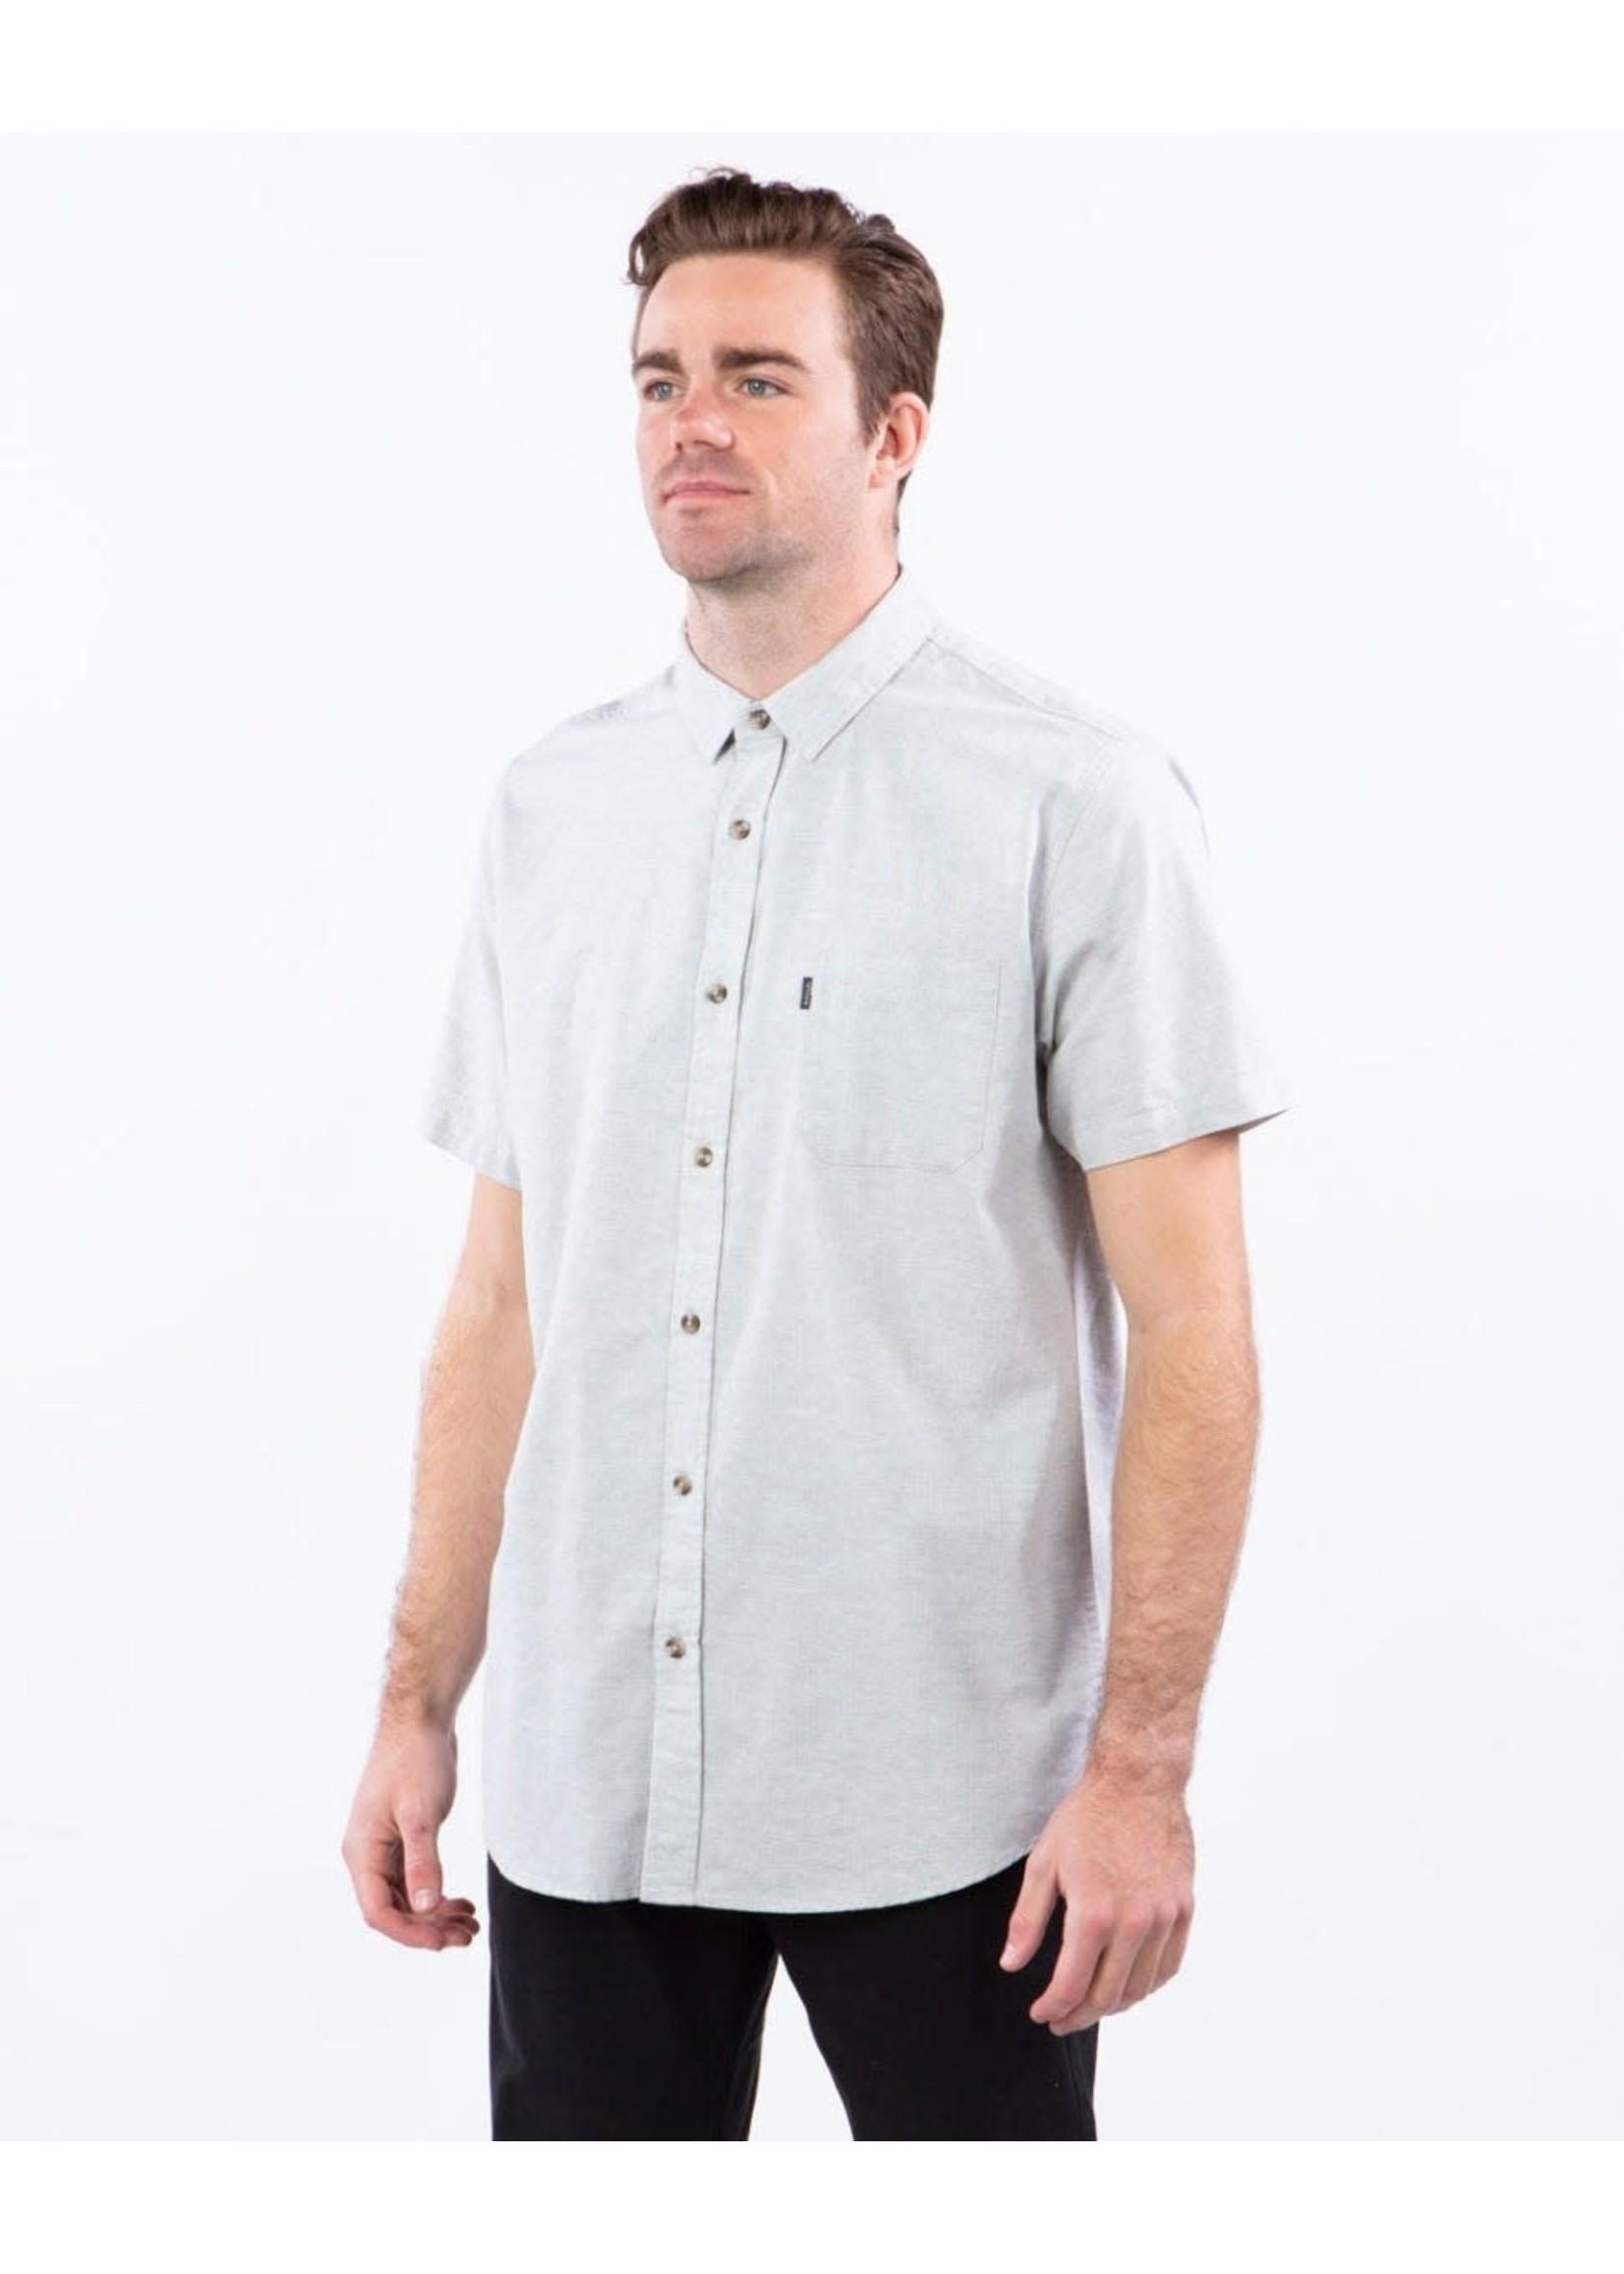 Ripcurl Ripcurl Our Time Short Sleeve Shirt